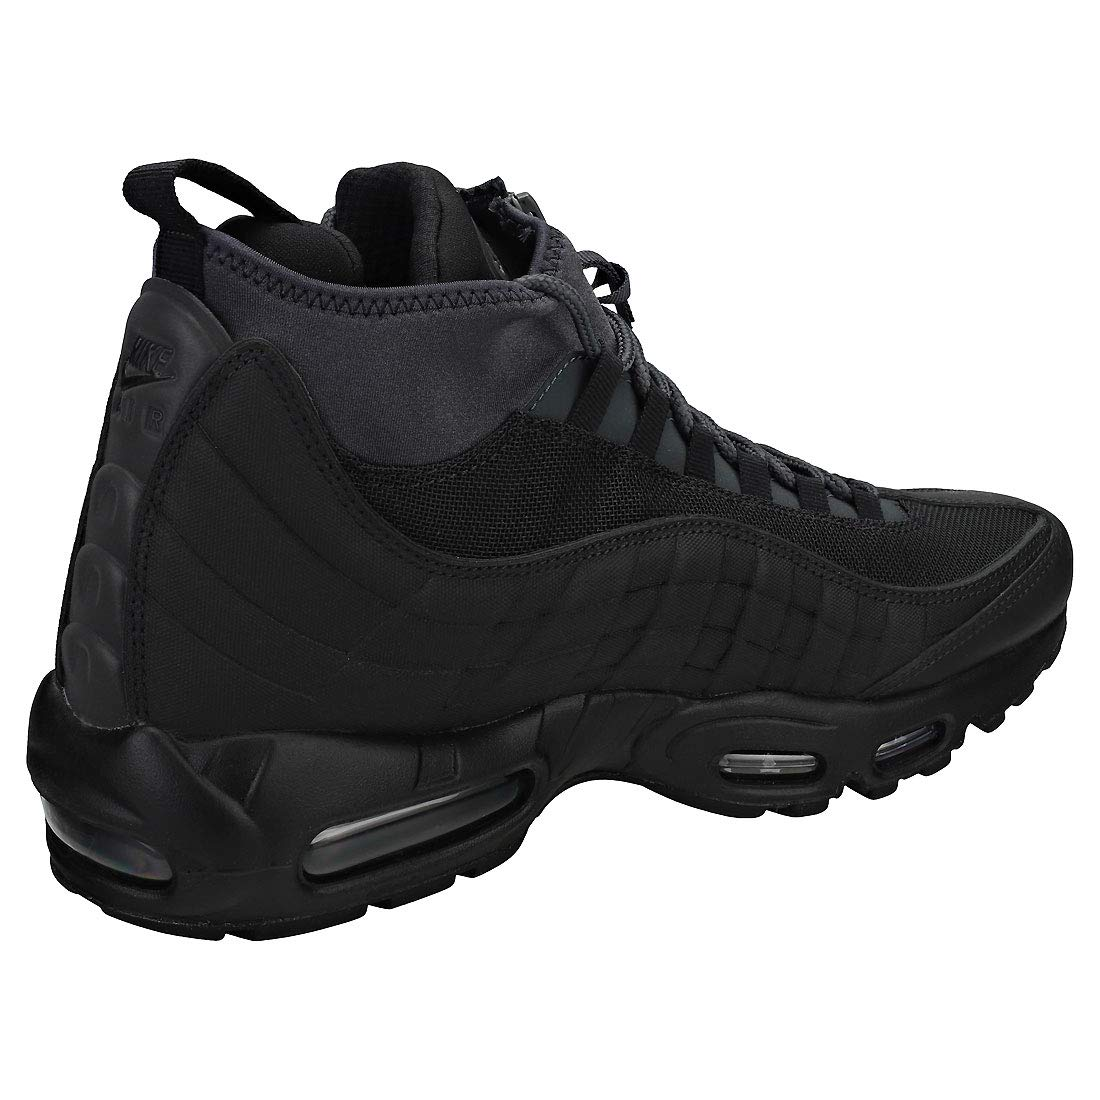 Nike Air Max 95 Sneakerboot, Chaussures de Randonnée Hautes Homme